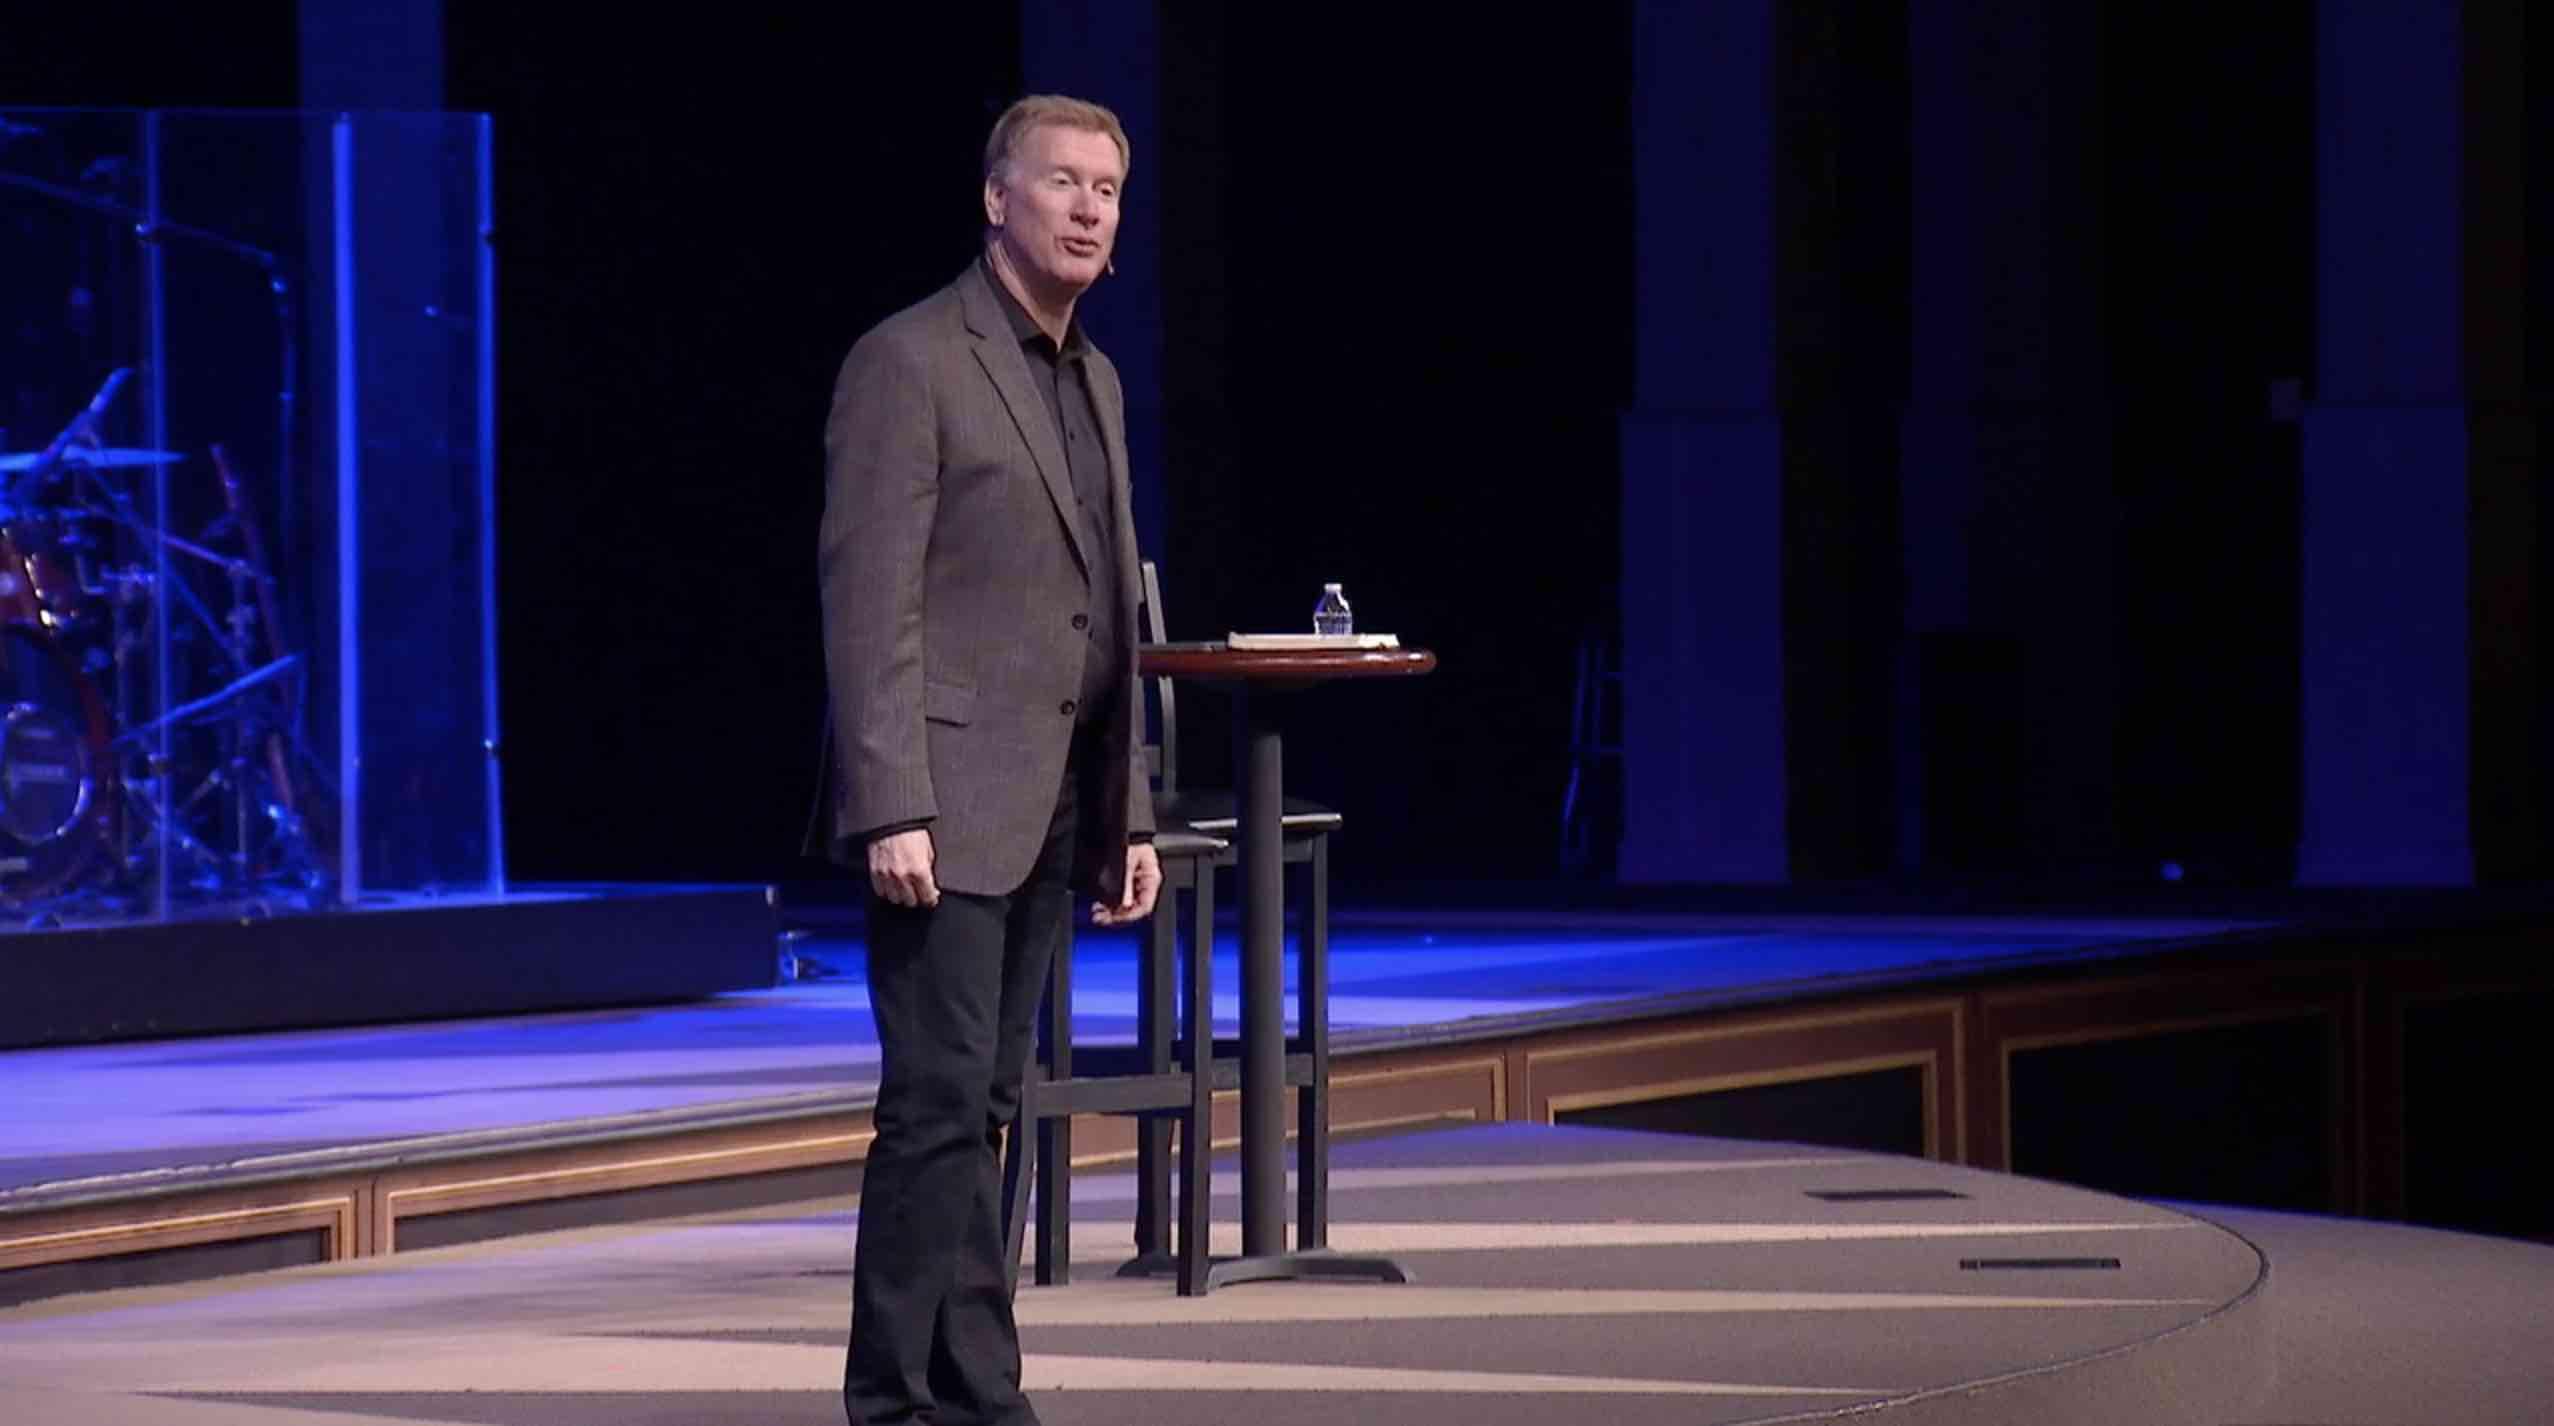 A Life-Giving Journey (Sermon)